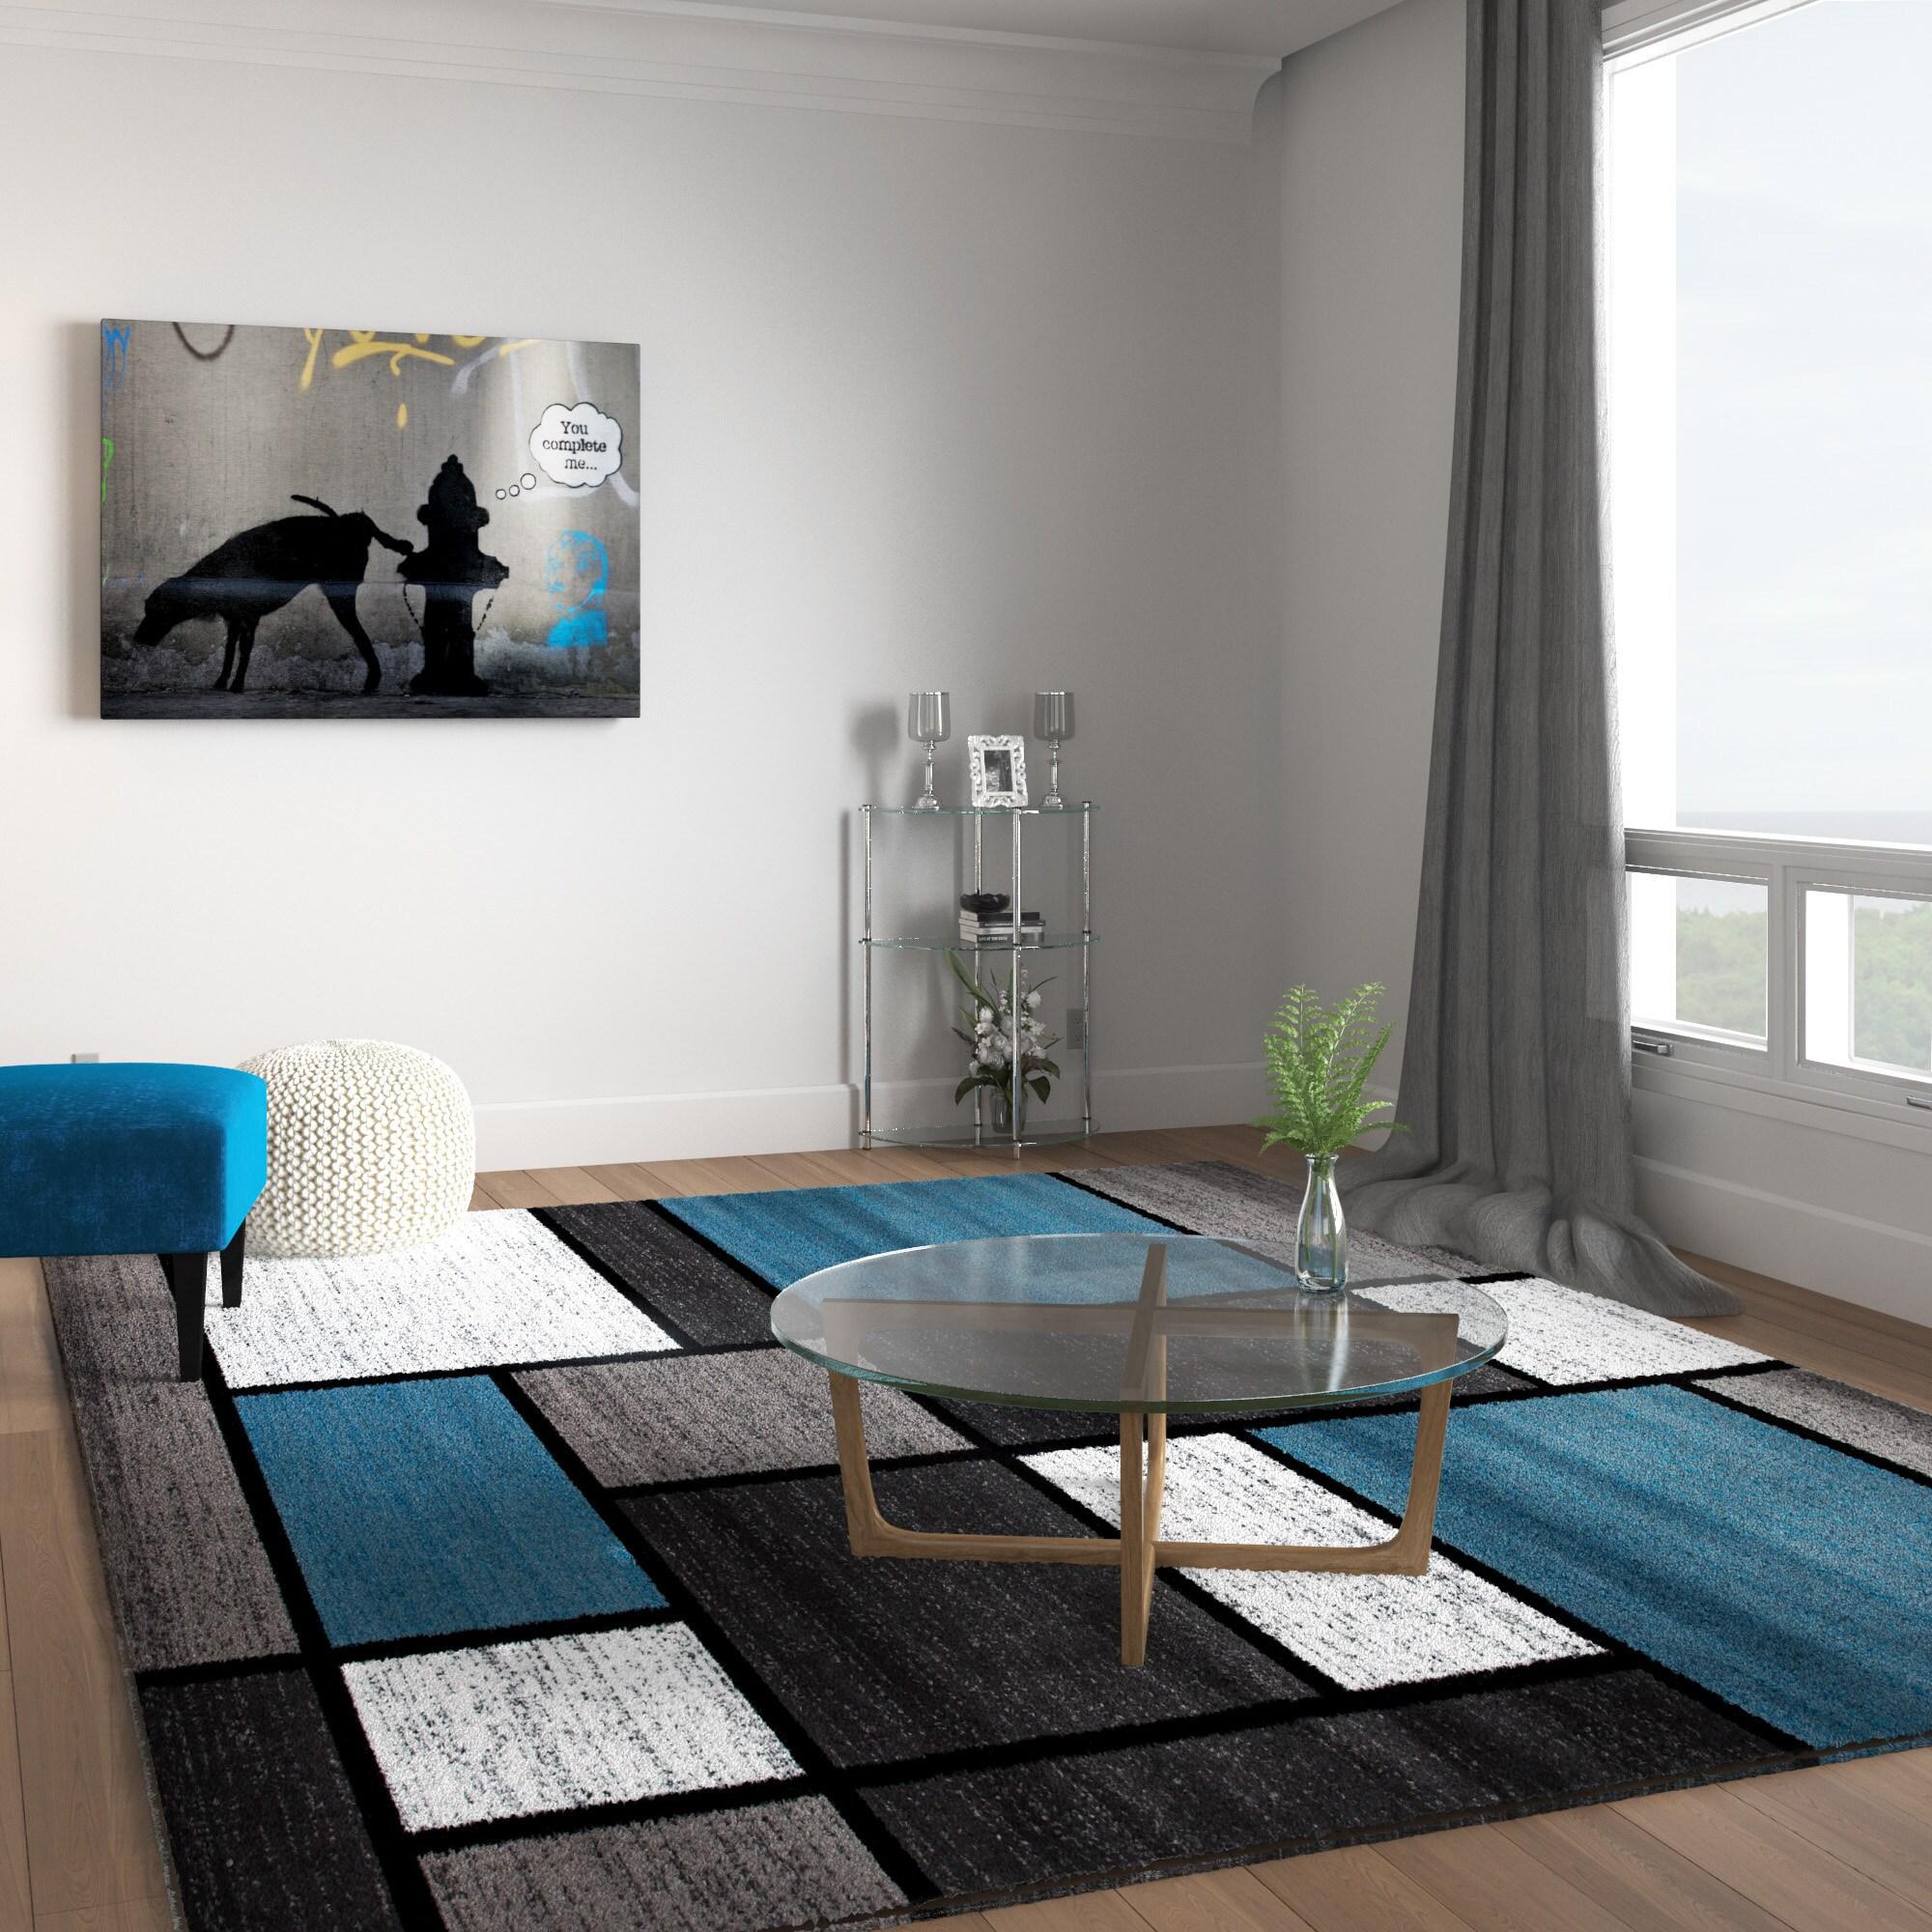 Contemporary Modern Boxes Blue Grey Area Rug 7 10 X 10 2 7 10 X 10 2